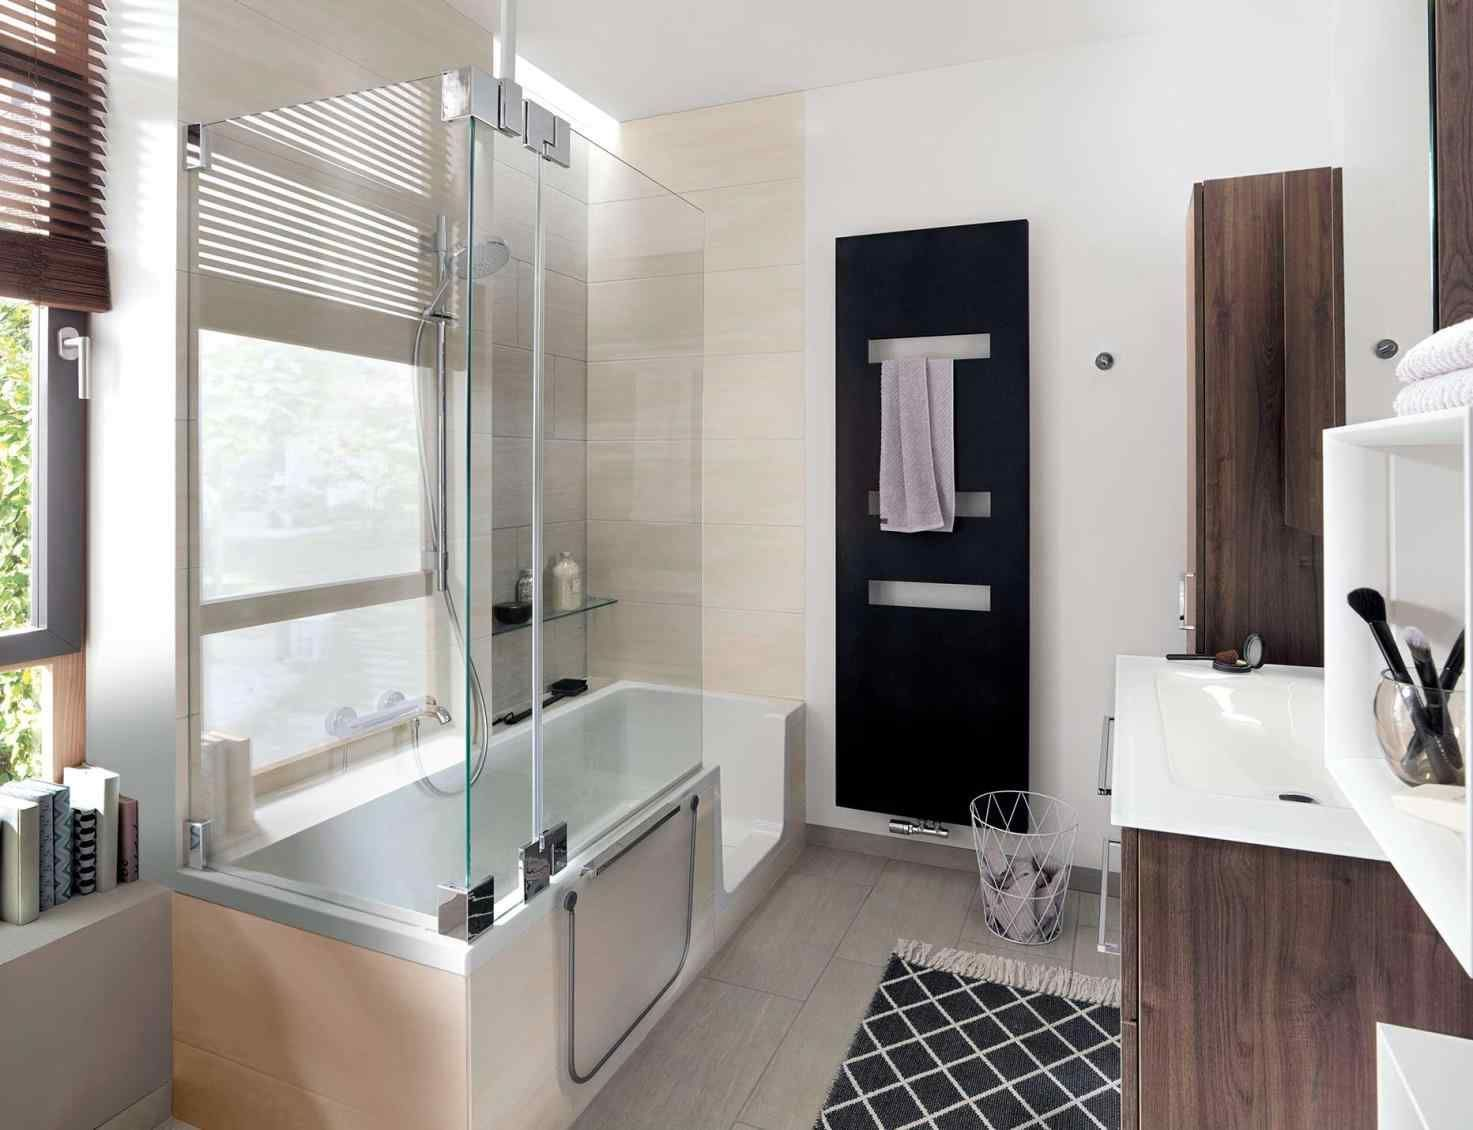 Bad Gestalten Modern Badezimmer Design Fliesen Ideen Badezimmer Bathroom Small Bathroom Bathroom Renovations